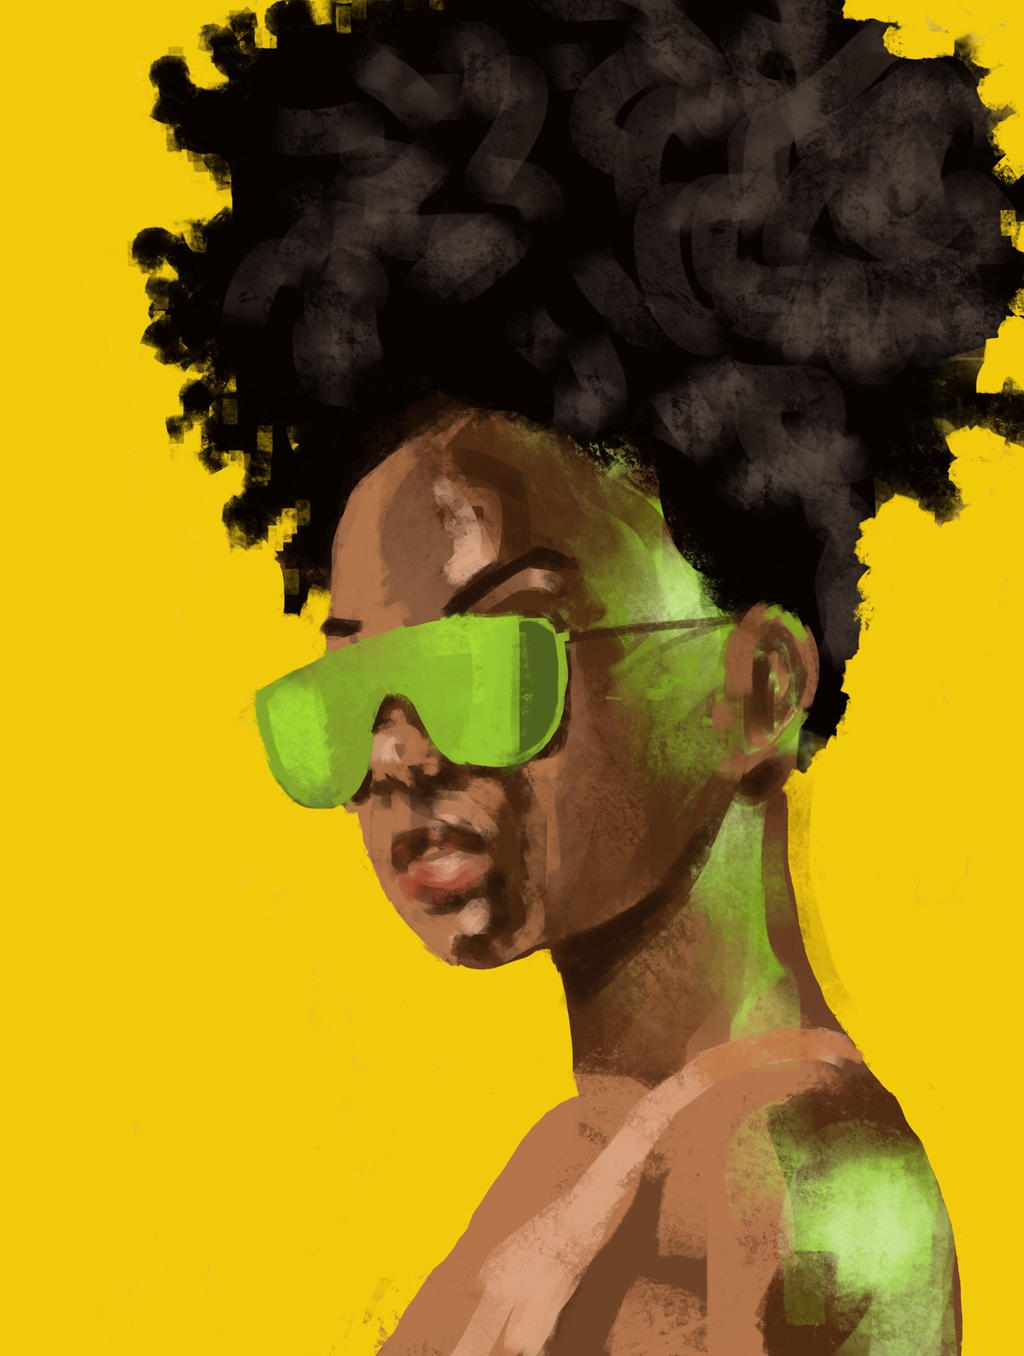 Green glow by JeremyWDunn